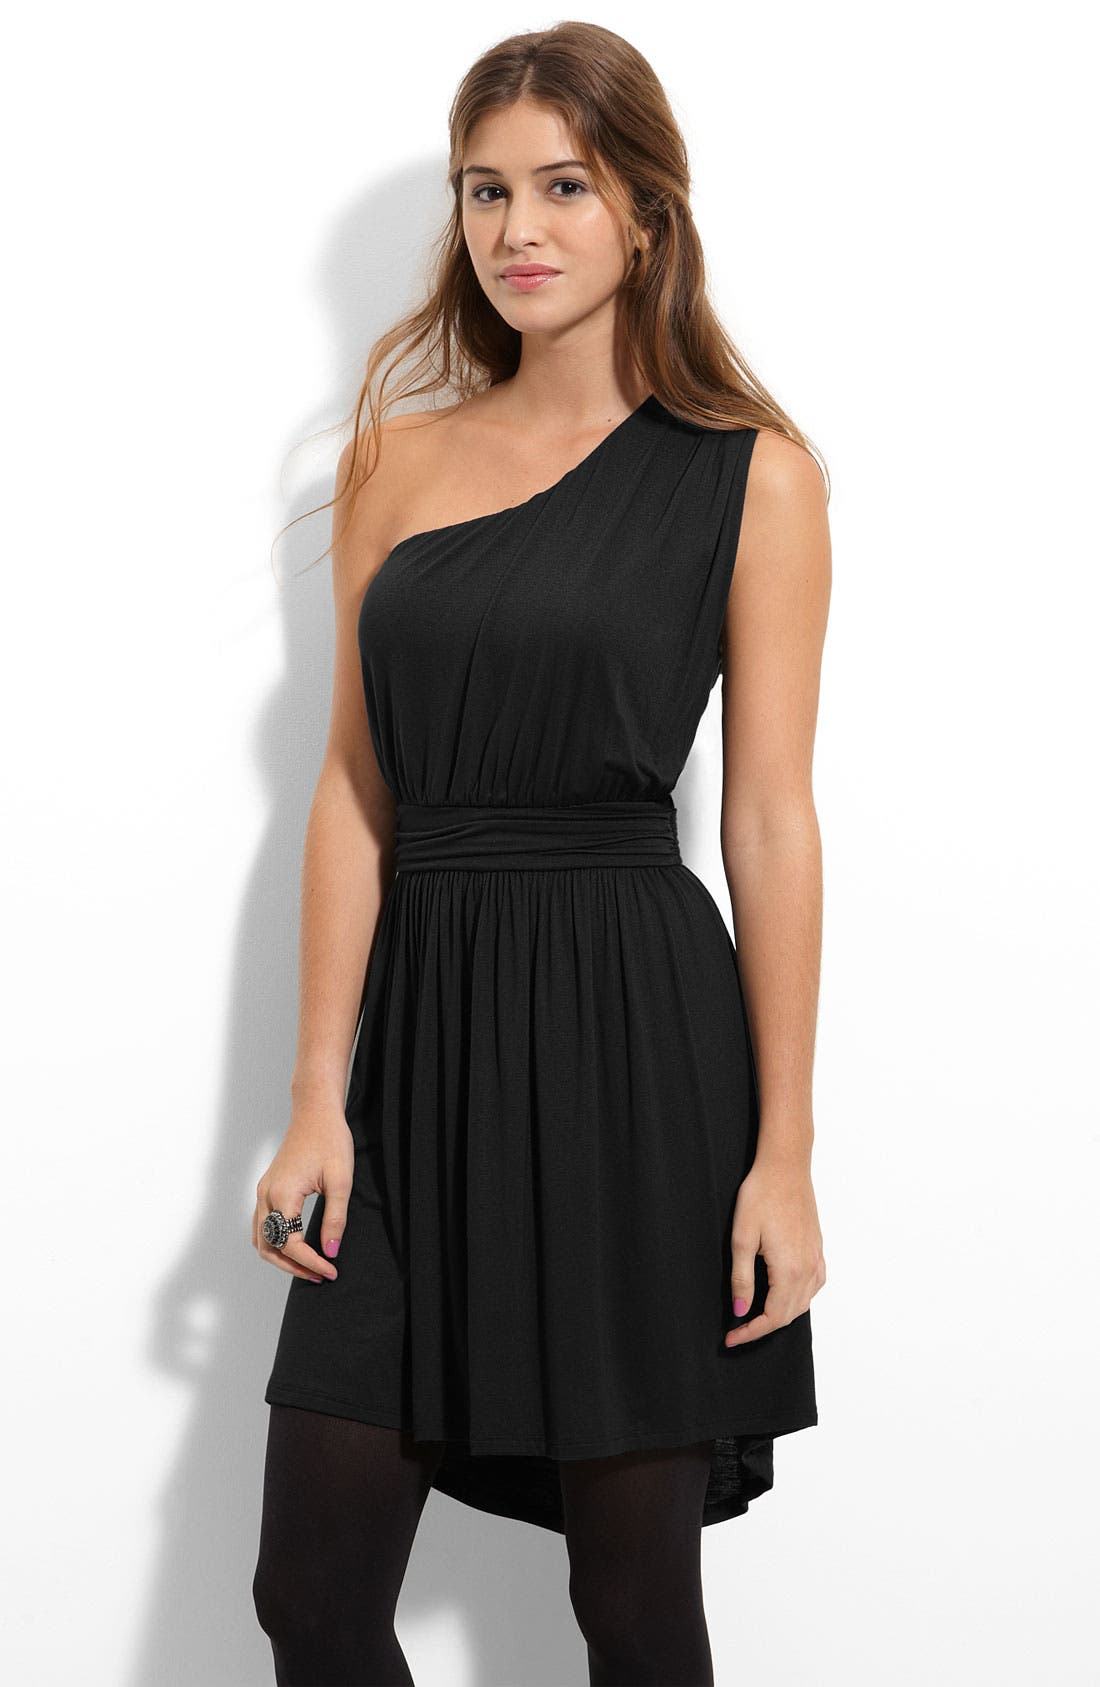 Alternate Image 1 Selected - Lush One Shoulder Knit Dress (Juniors)